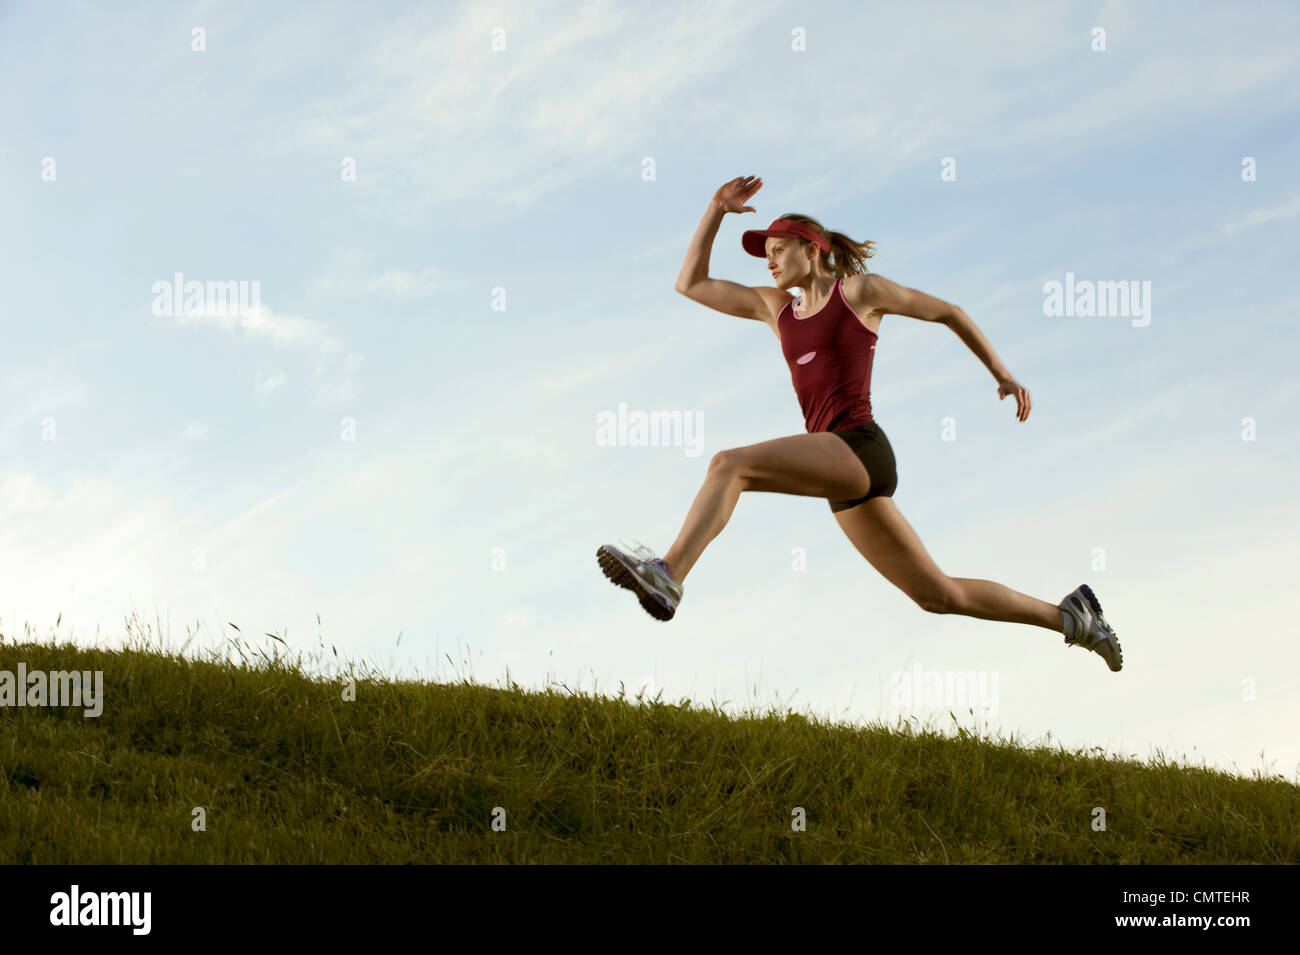 Kaukasische Läufer im Feld laufen Stockfoto